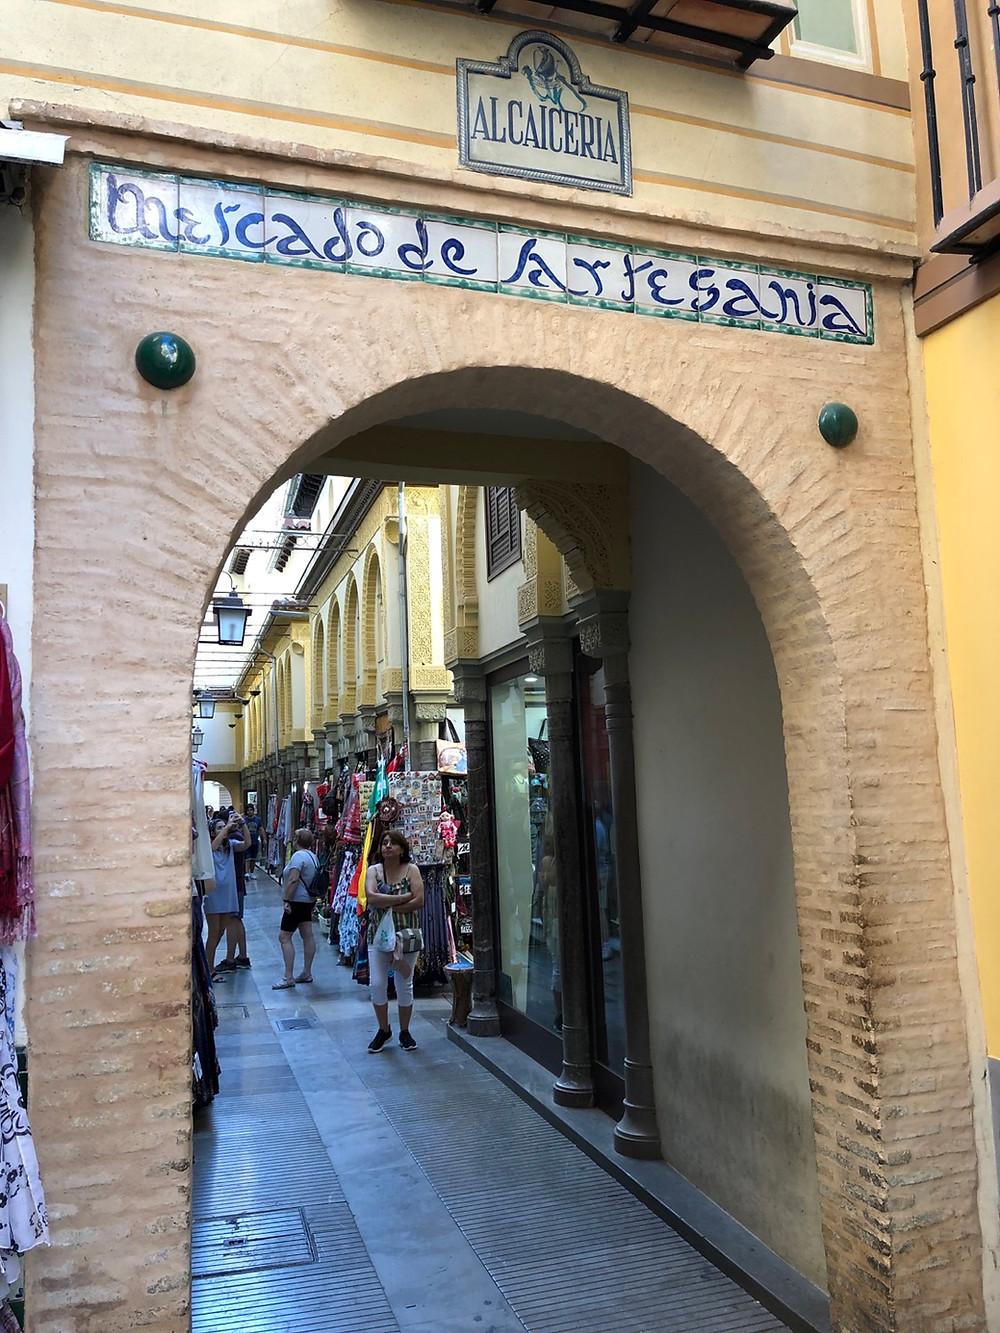 Calle Alcaiceria